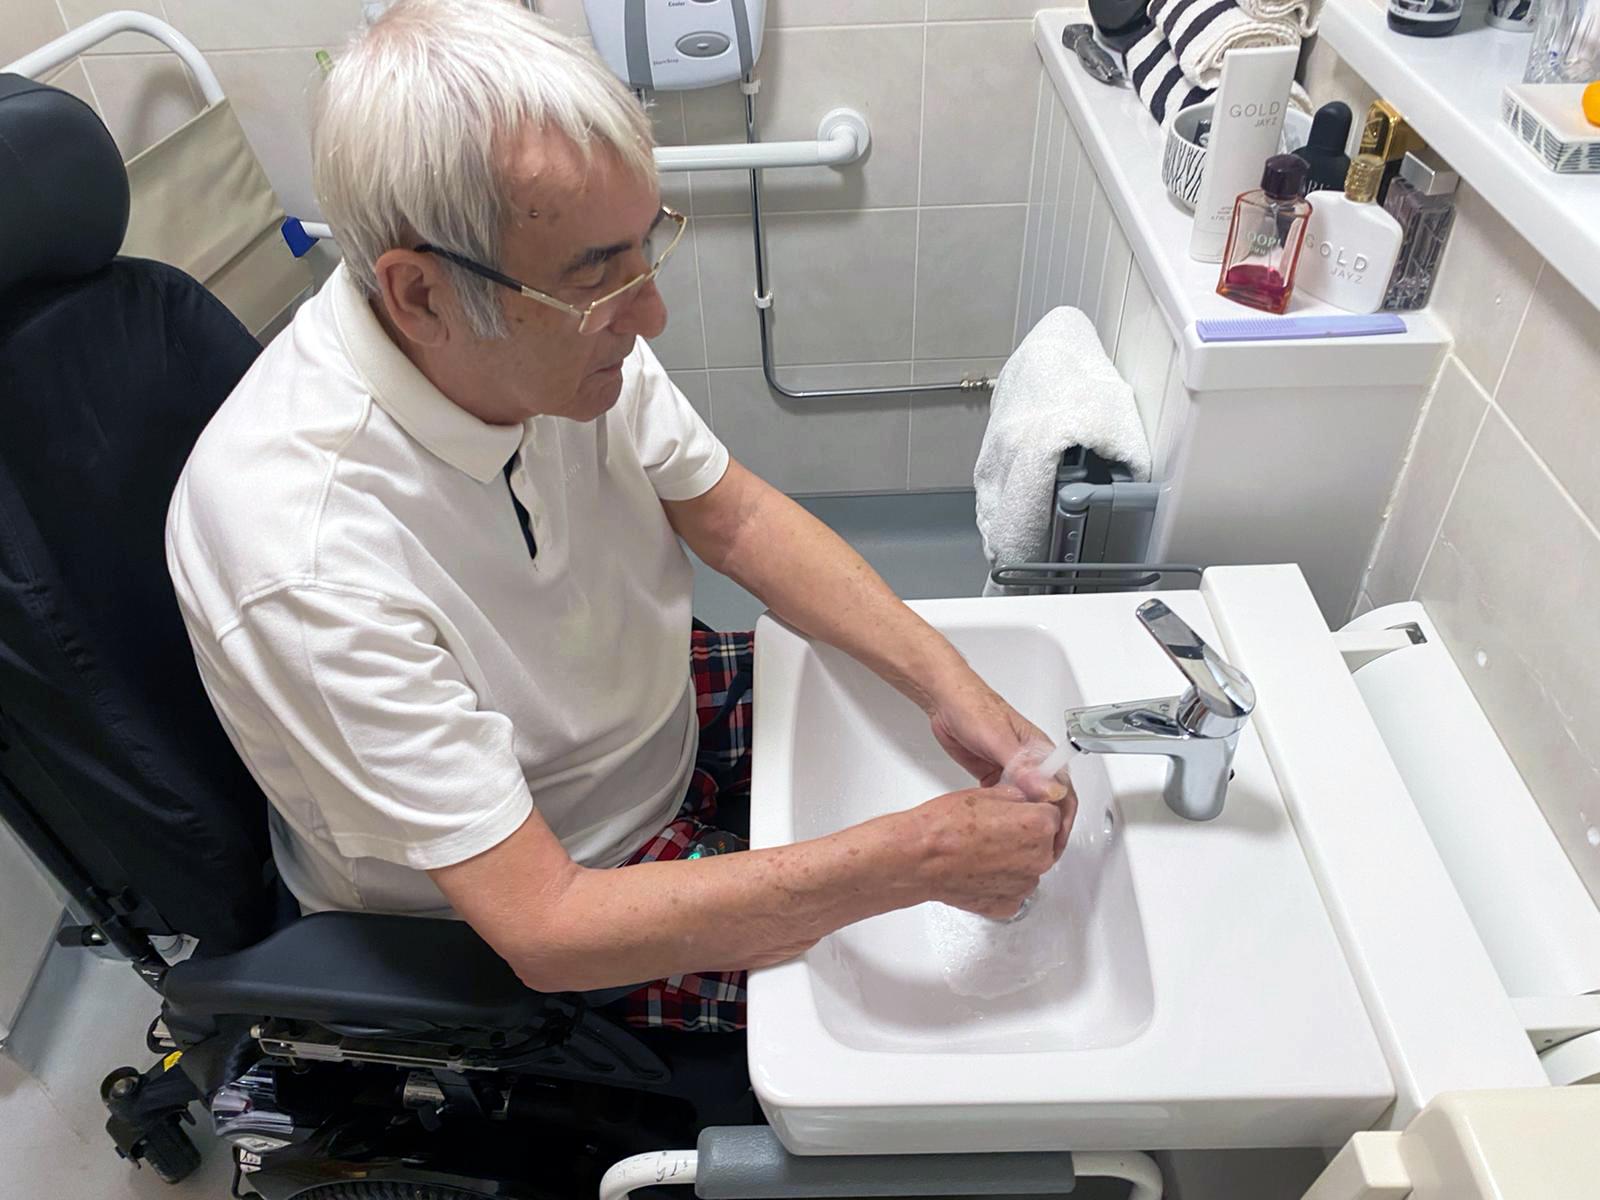 Ropox reveals accessible bathroom solutions